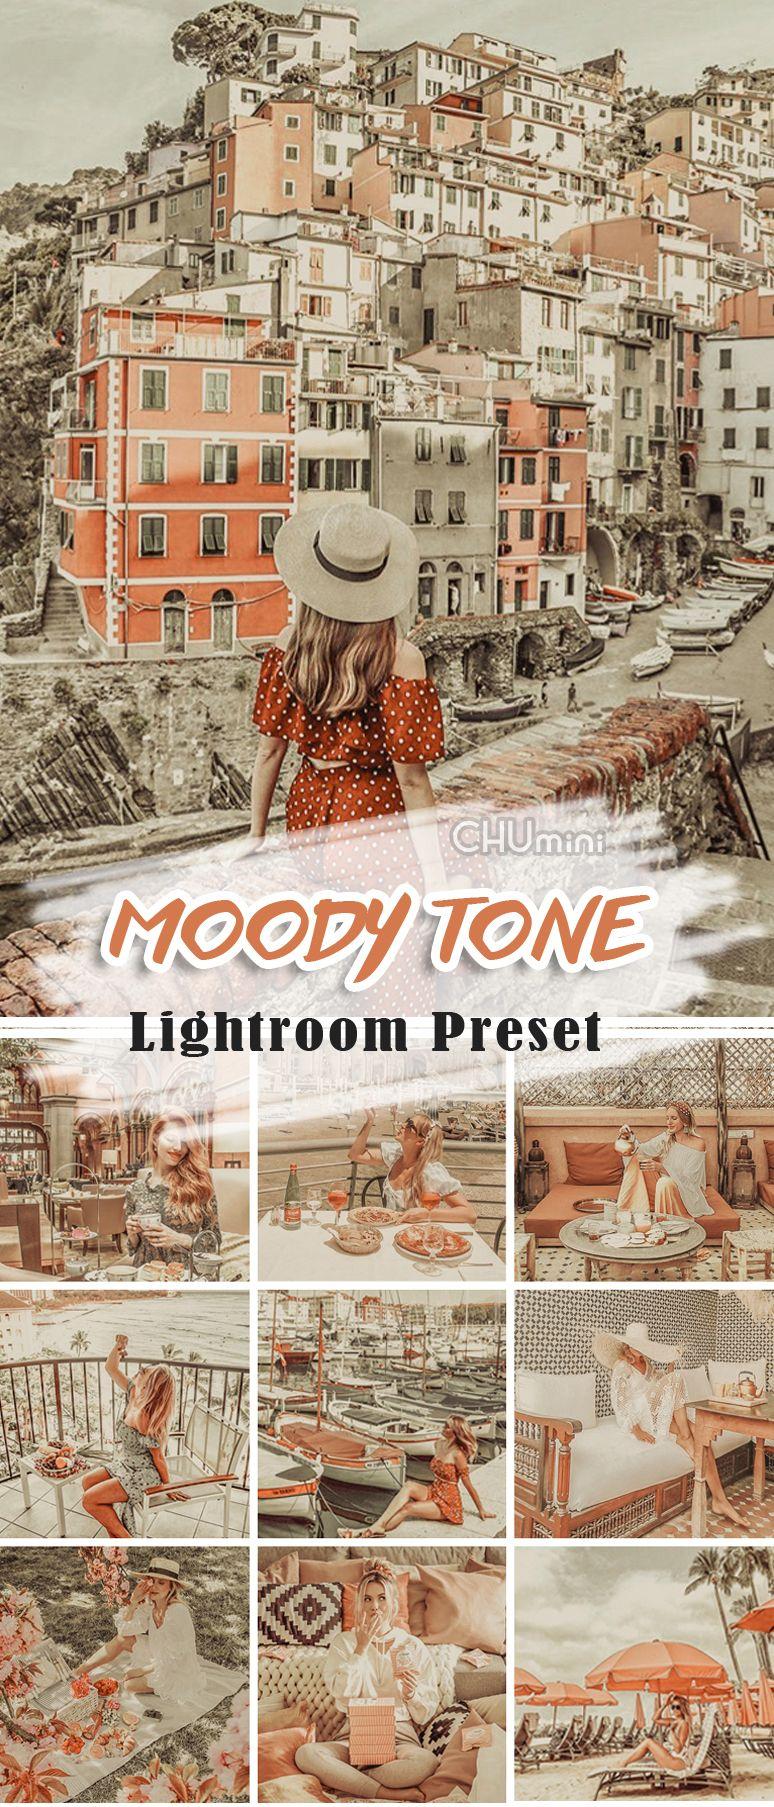 Lightroom Preset Lightroom Presets Tutorial Lightroom Tutorial Photo Editing Lightroom